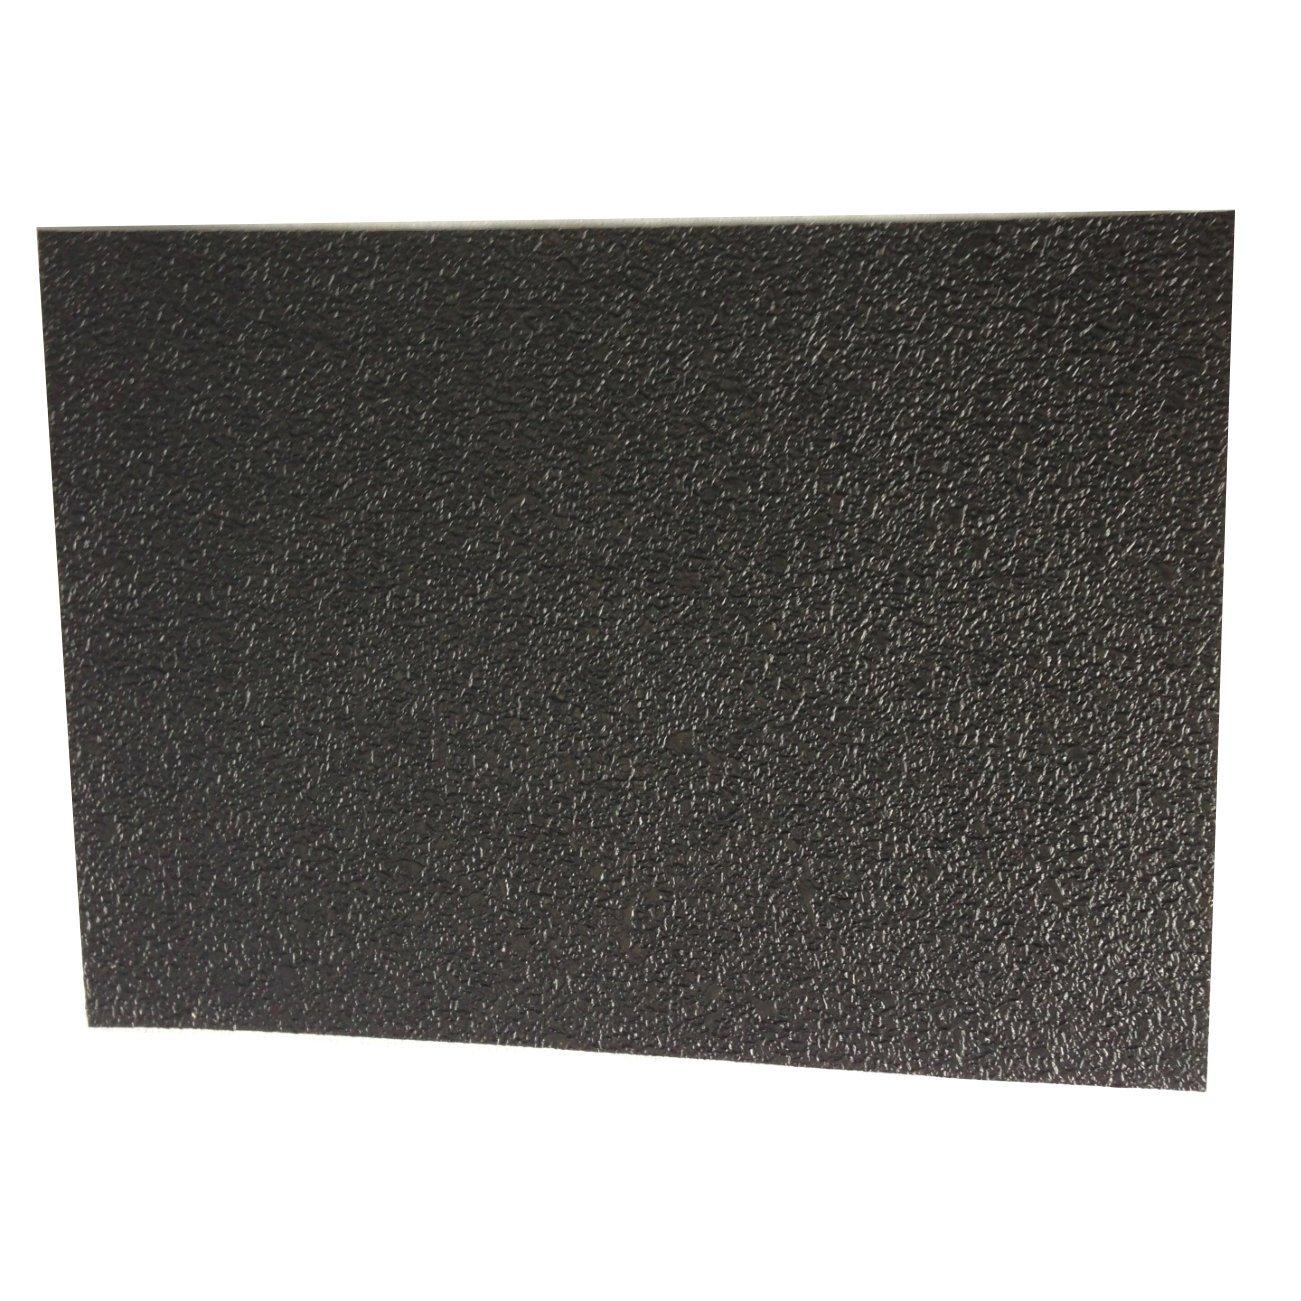 5 x 7-Inch TALON Grips Material Sheet